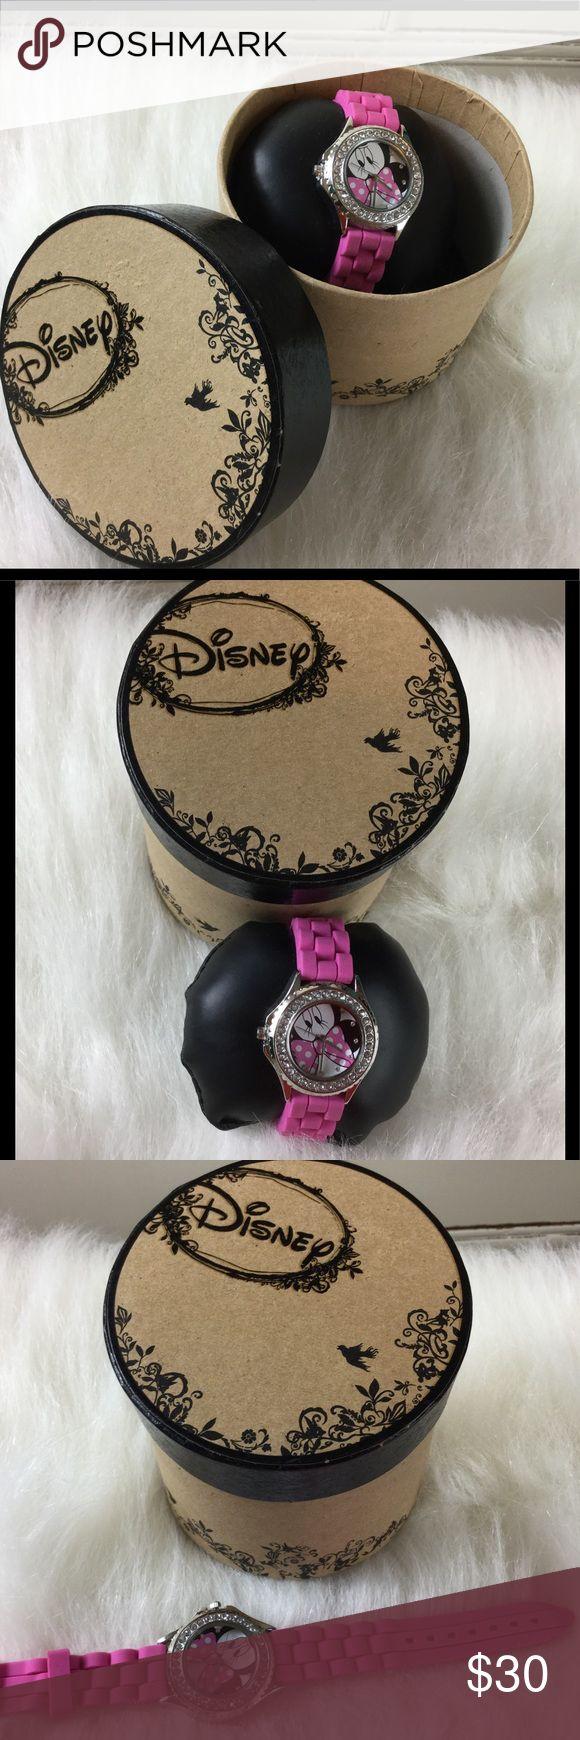 Brand New Disney Watch Brand New Disney Minnie Mouse Watch Disney Accessories Watches